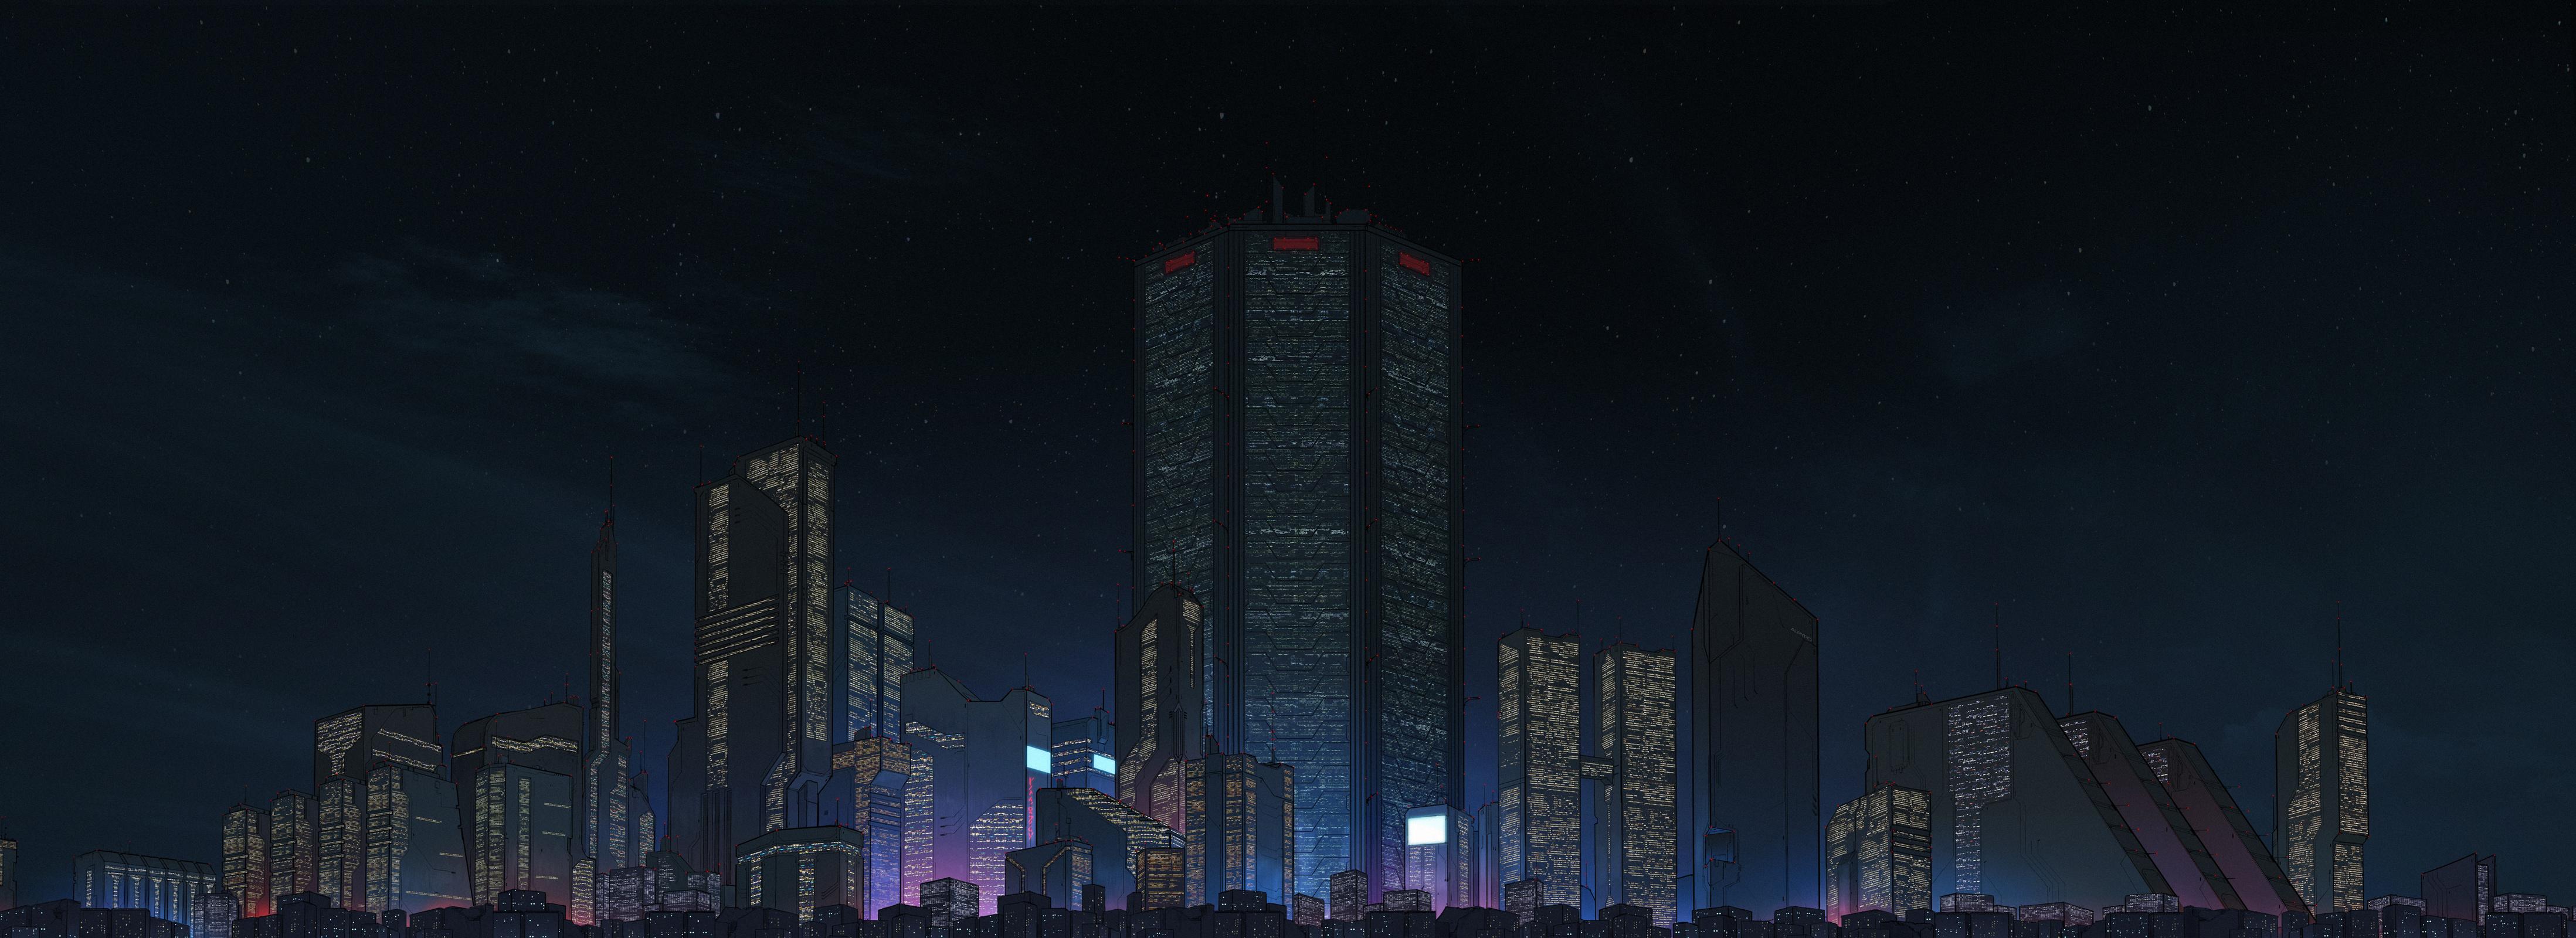 General 4393x1600 cyberpunk city ultrawide 4K